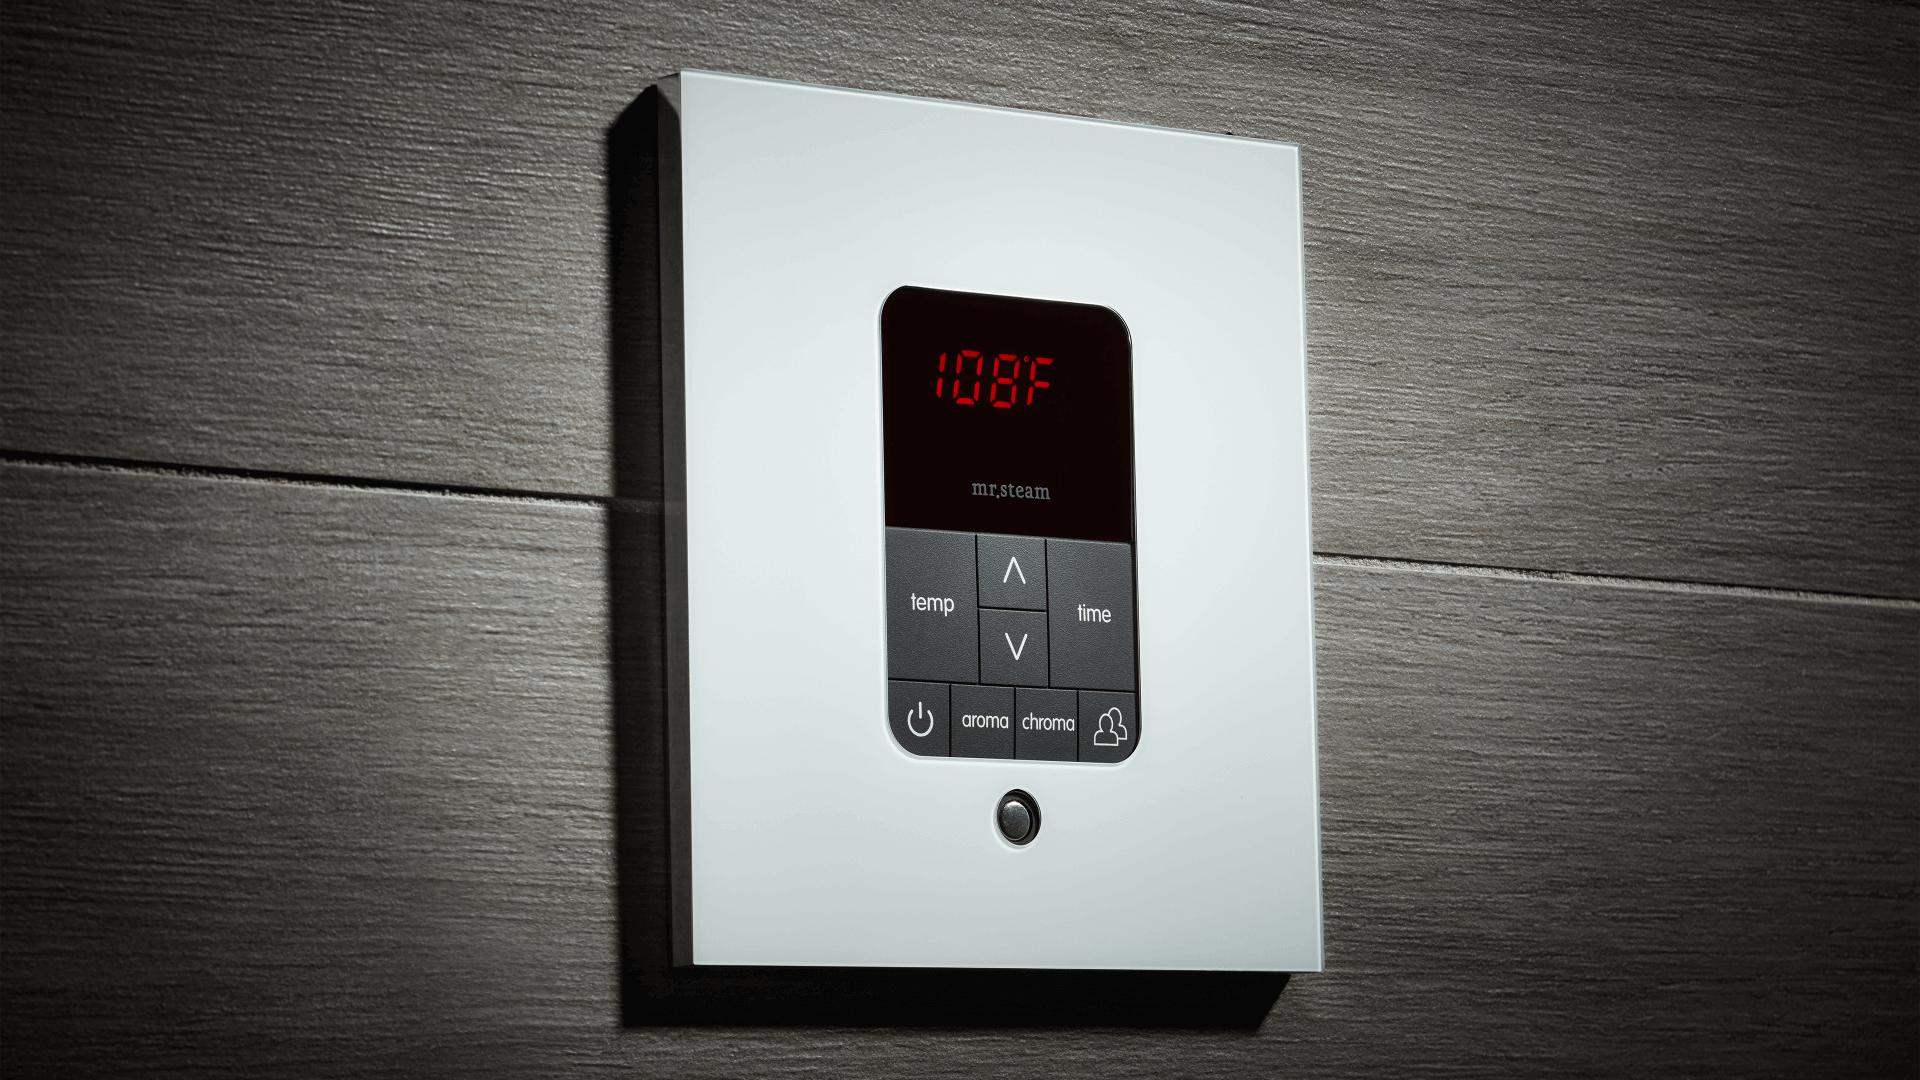 itempoplus residential steam shower control mrsteam Block Diagram